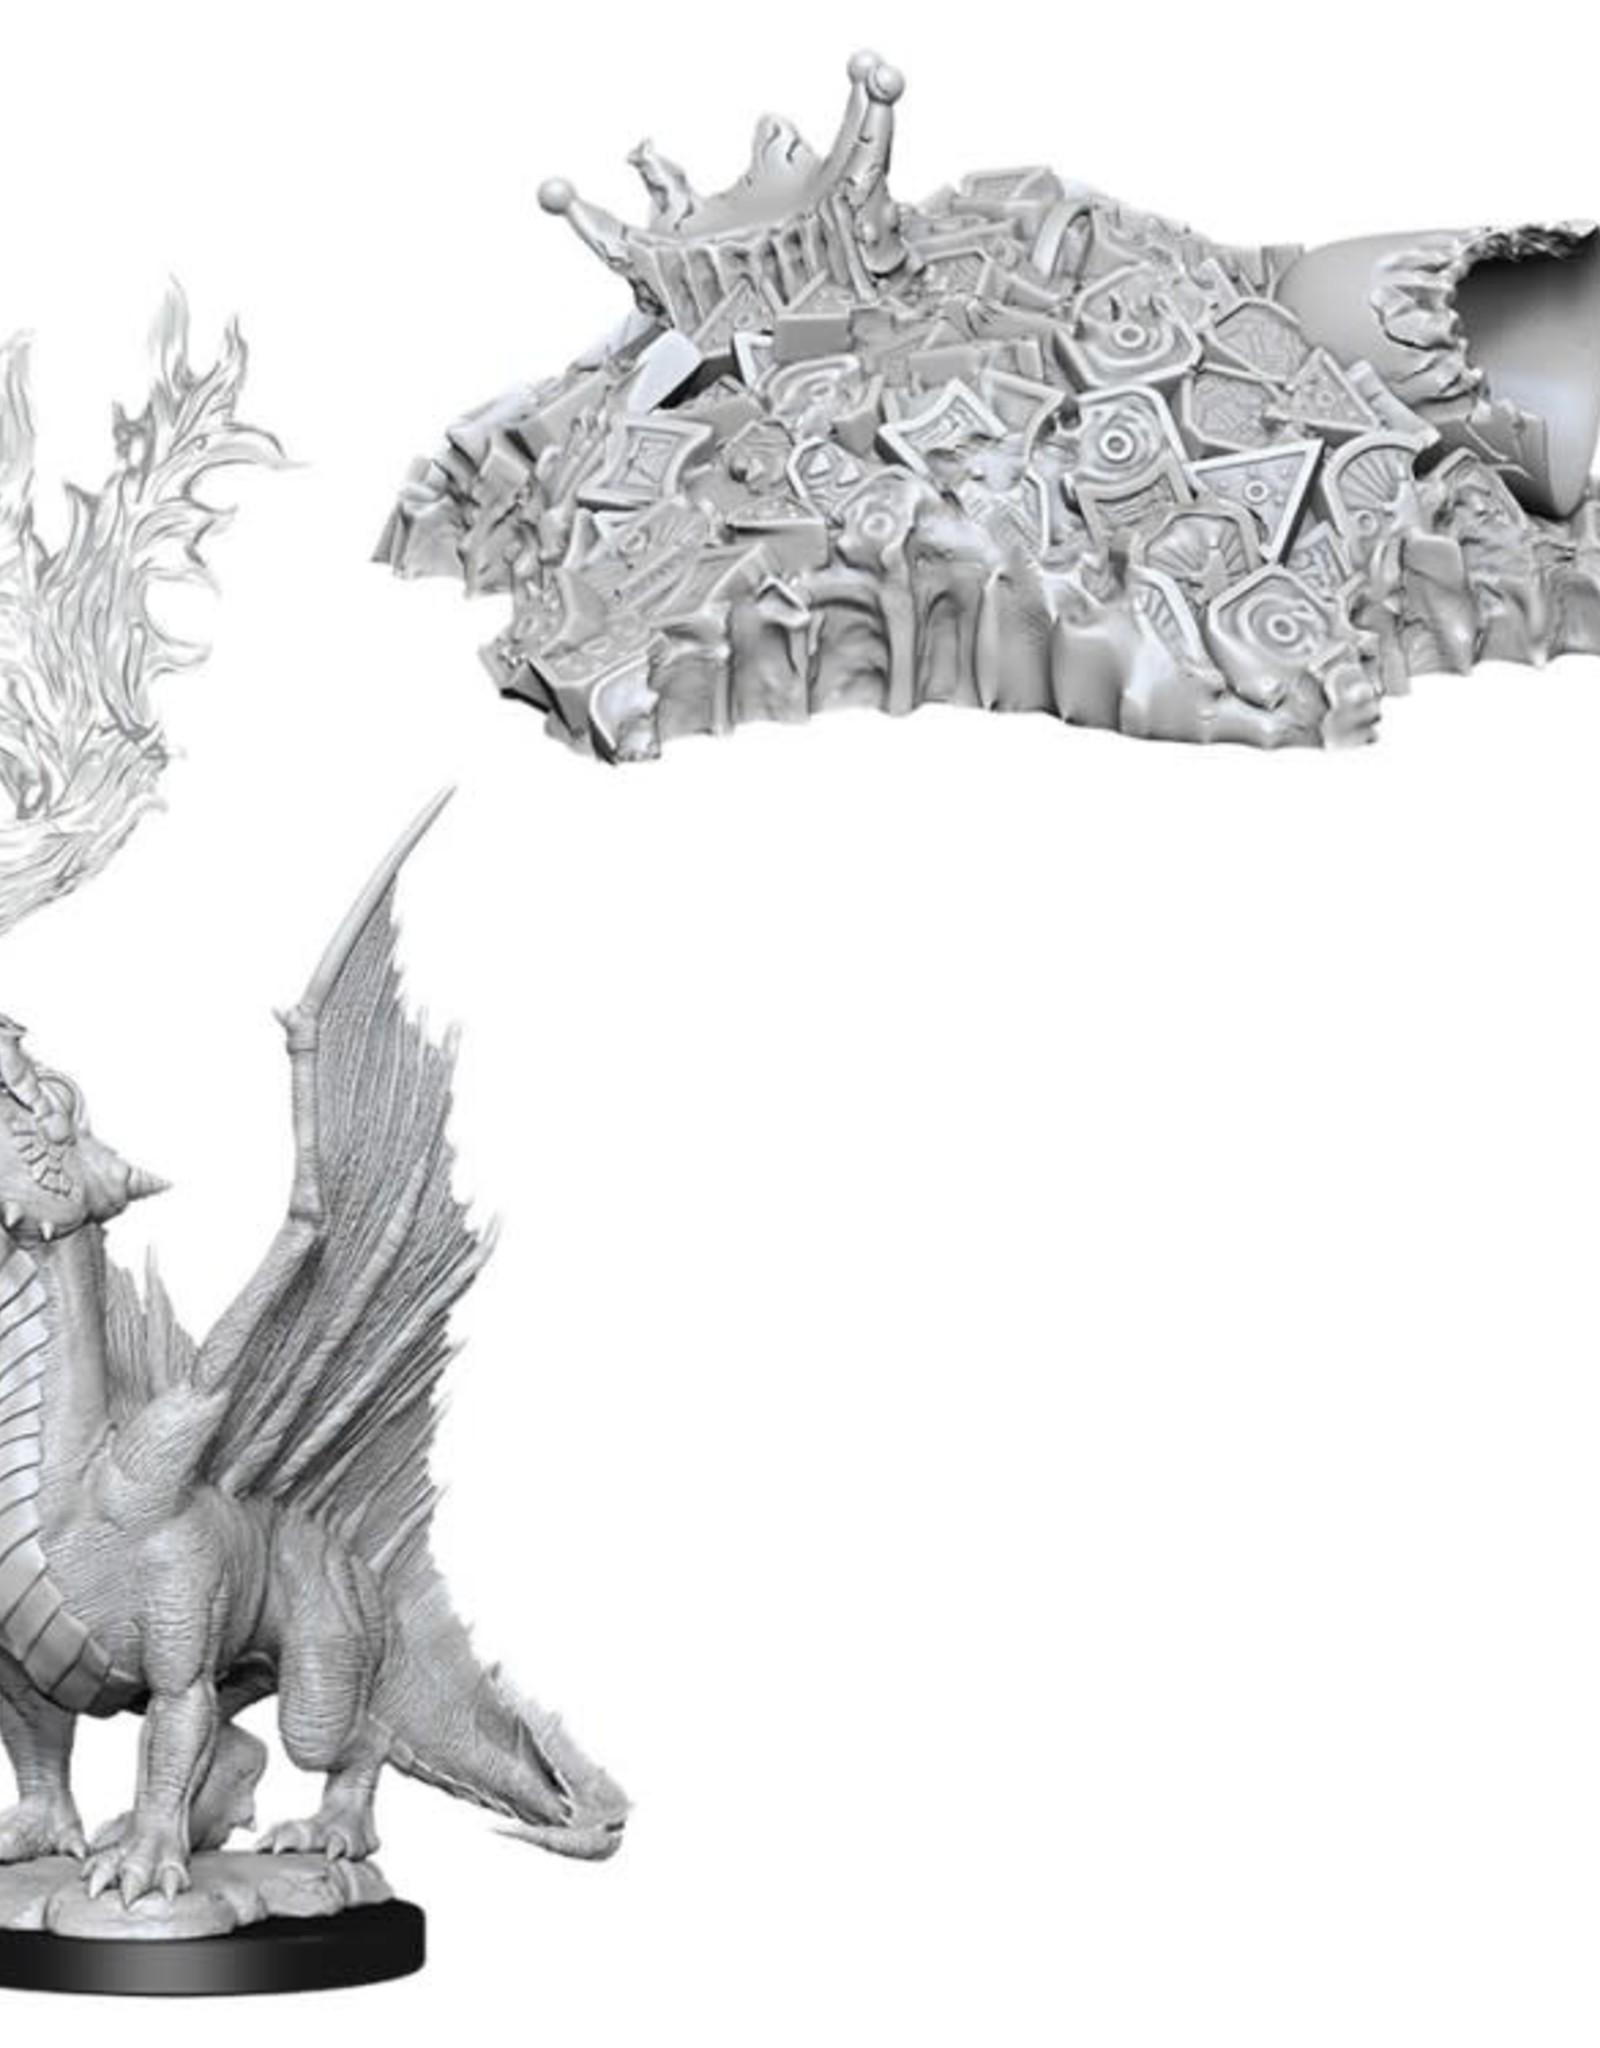 WizKids D&D Nolzur Gold Dragon Wyrmling & Half-Eaten Treasure Pile